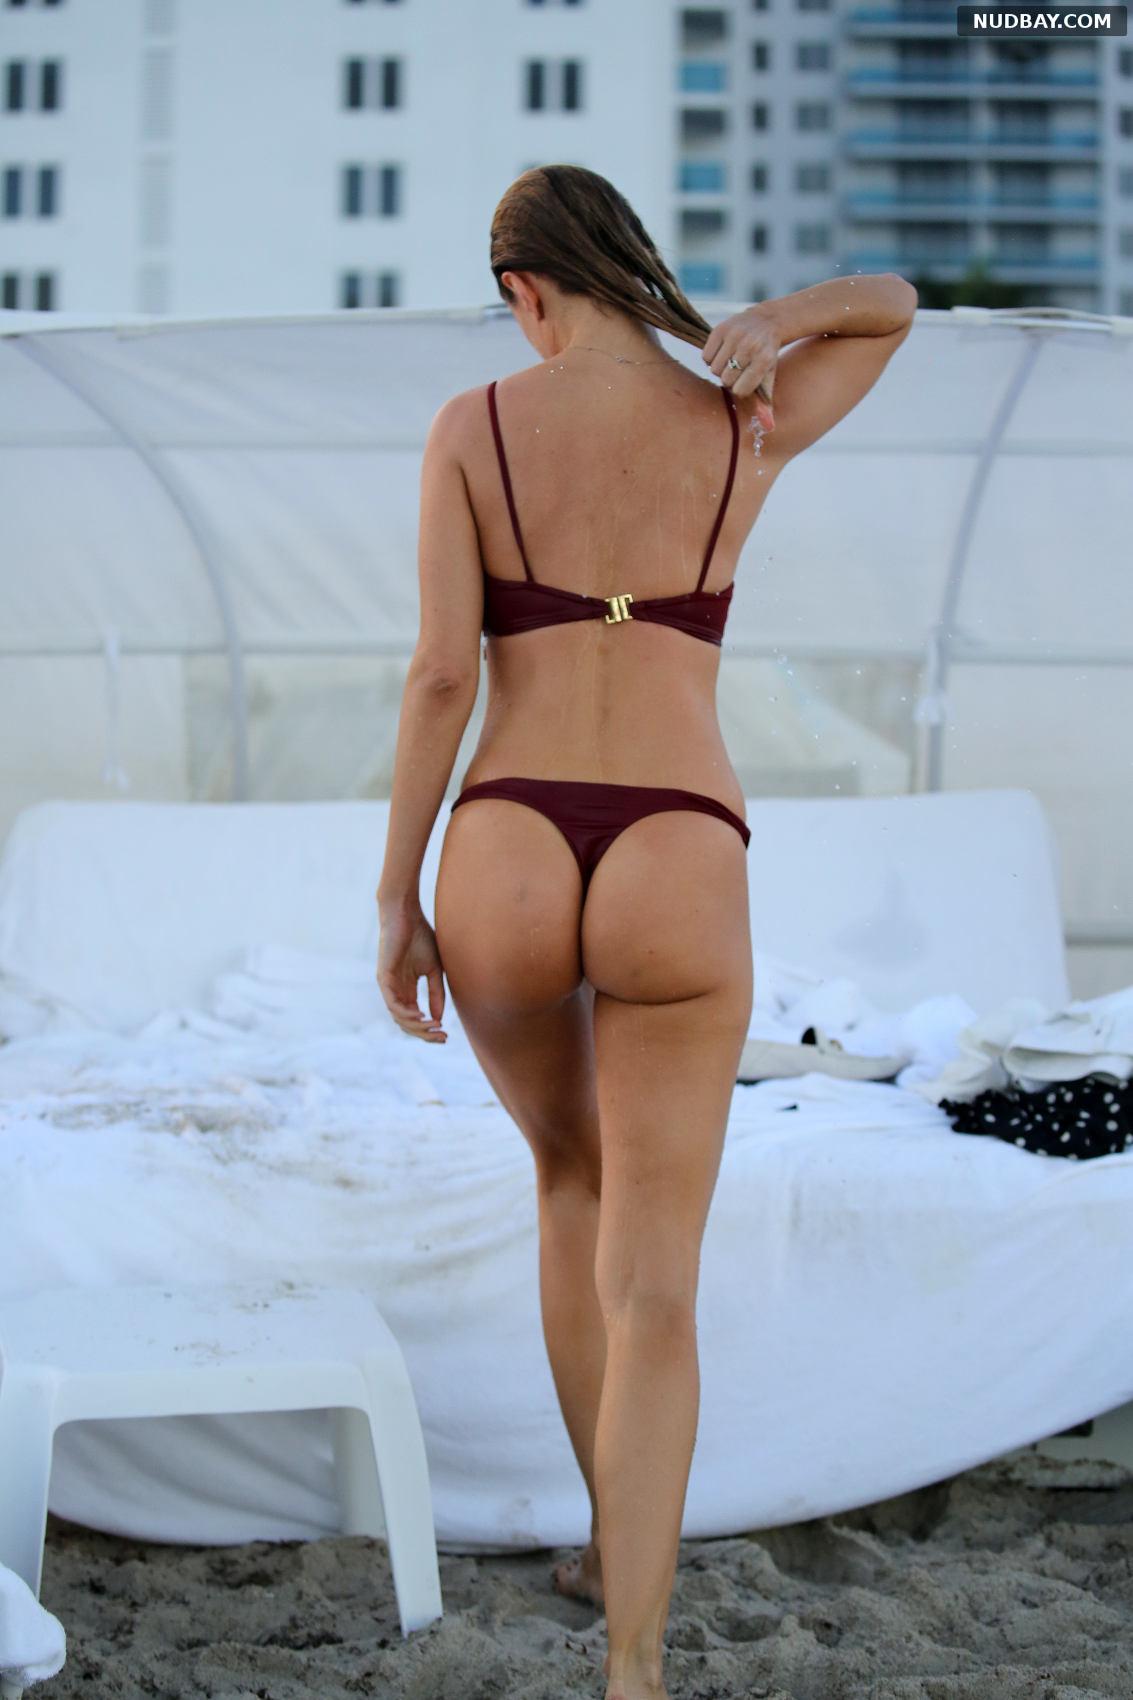 Kimberley Garner in a bikini on the beach in Miami Feb 30 2018